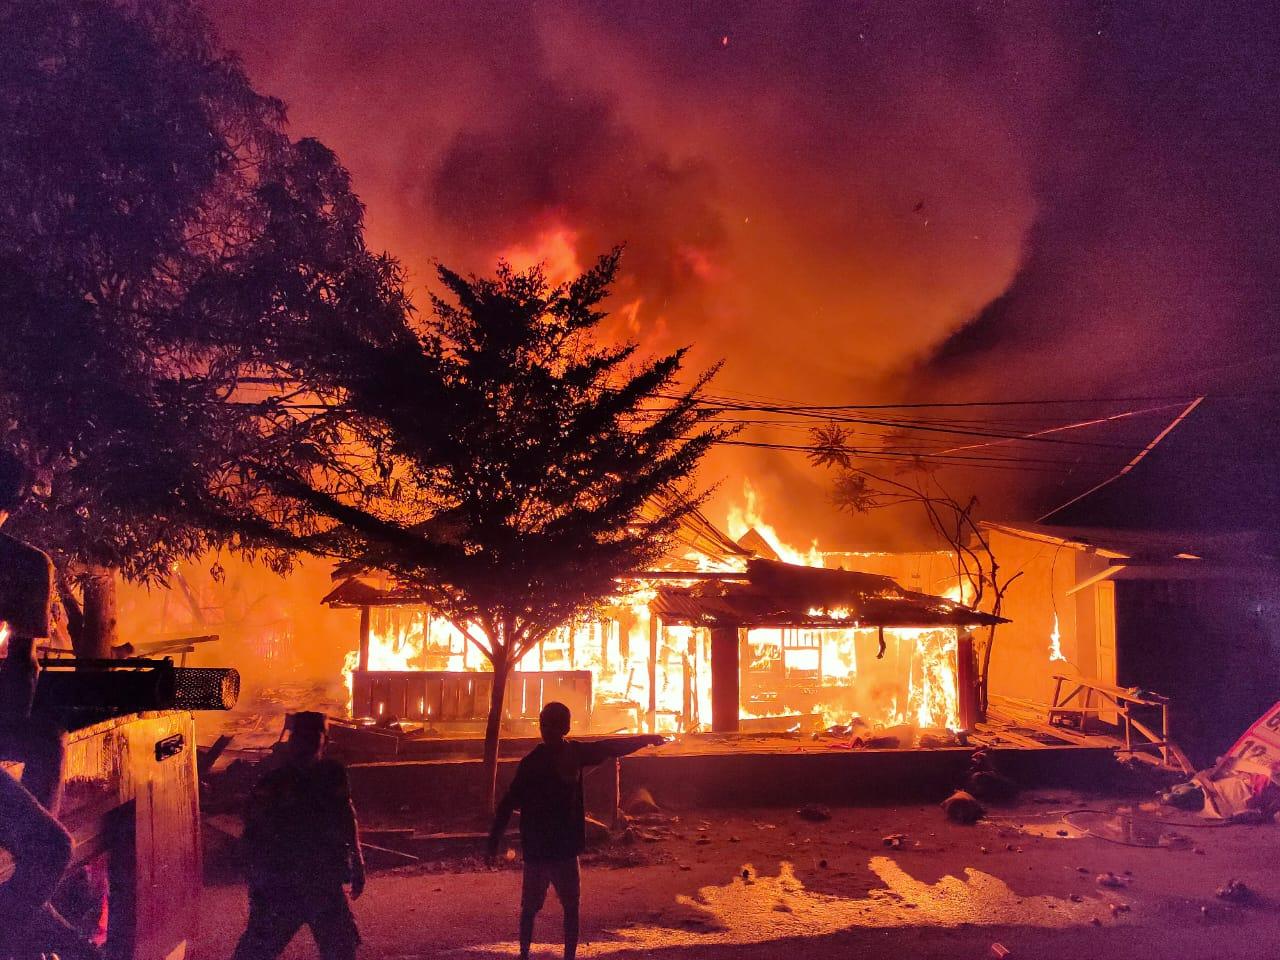 Peristiwa kebakaran di Jalan Sunu, Kabupaten Kolaka 19/2/2020. (Foto : Wawan/kolakainfo)